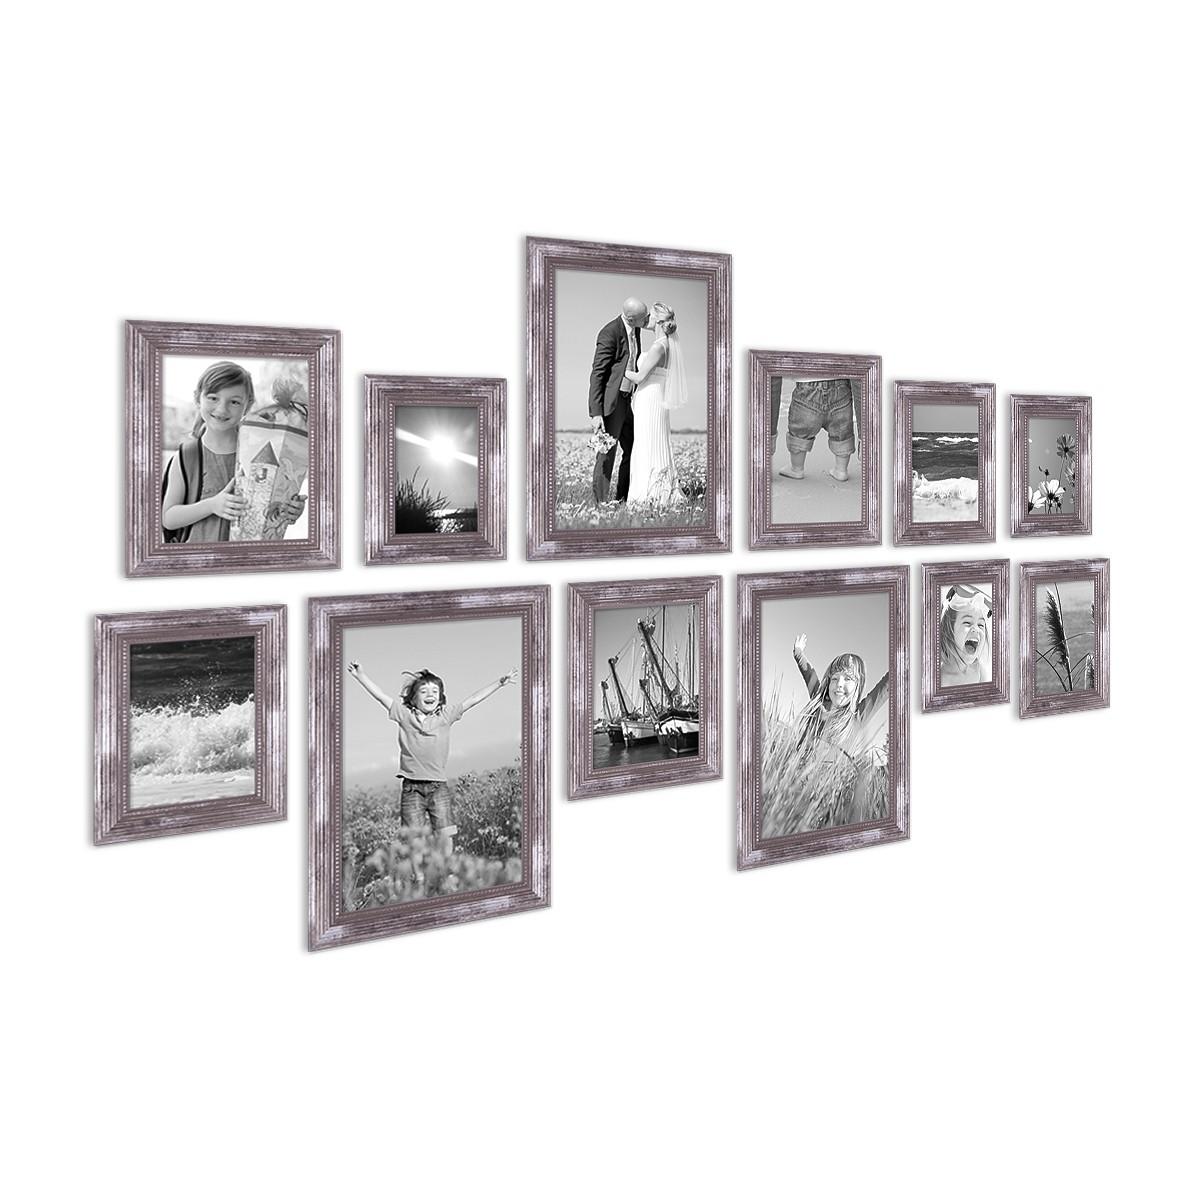 12er set bilderrahmen silber barock antik 10x15 13x18 15x20 und 20x30 cm inkl zubeh r. Black Bedroom Furniture Sets. Home Design Ideas